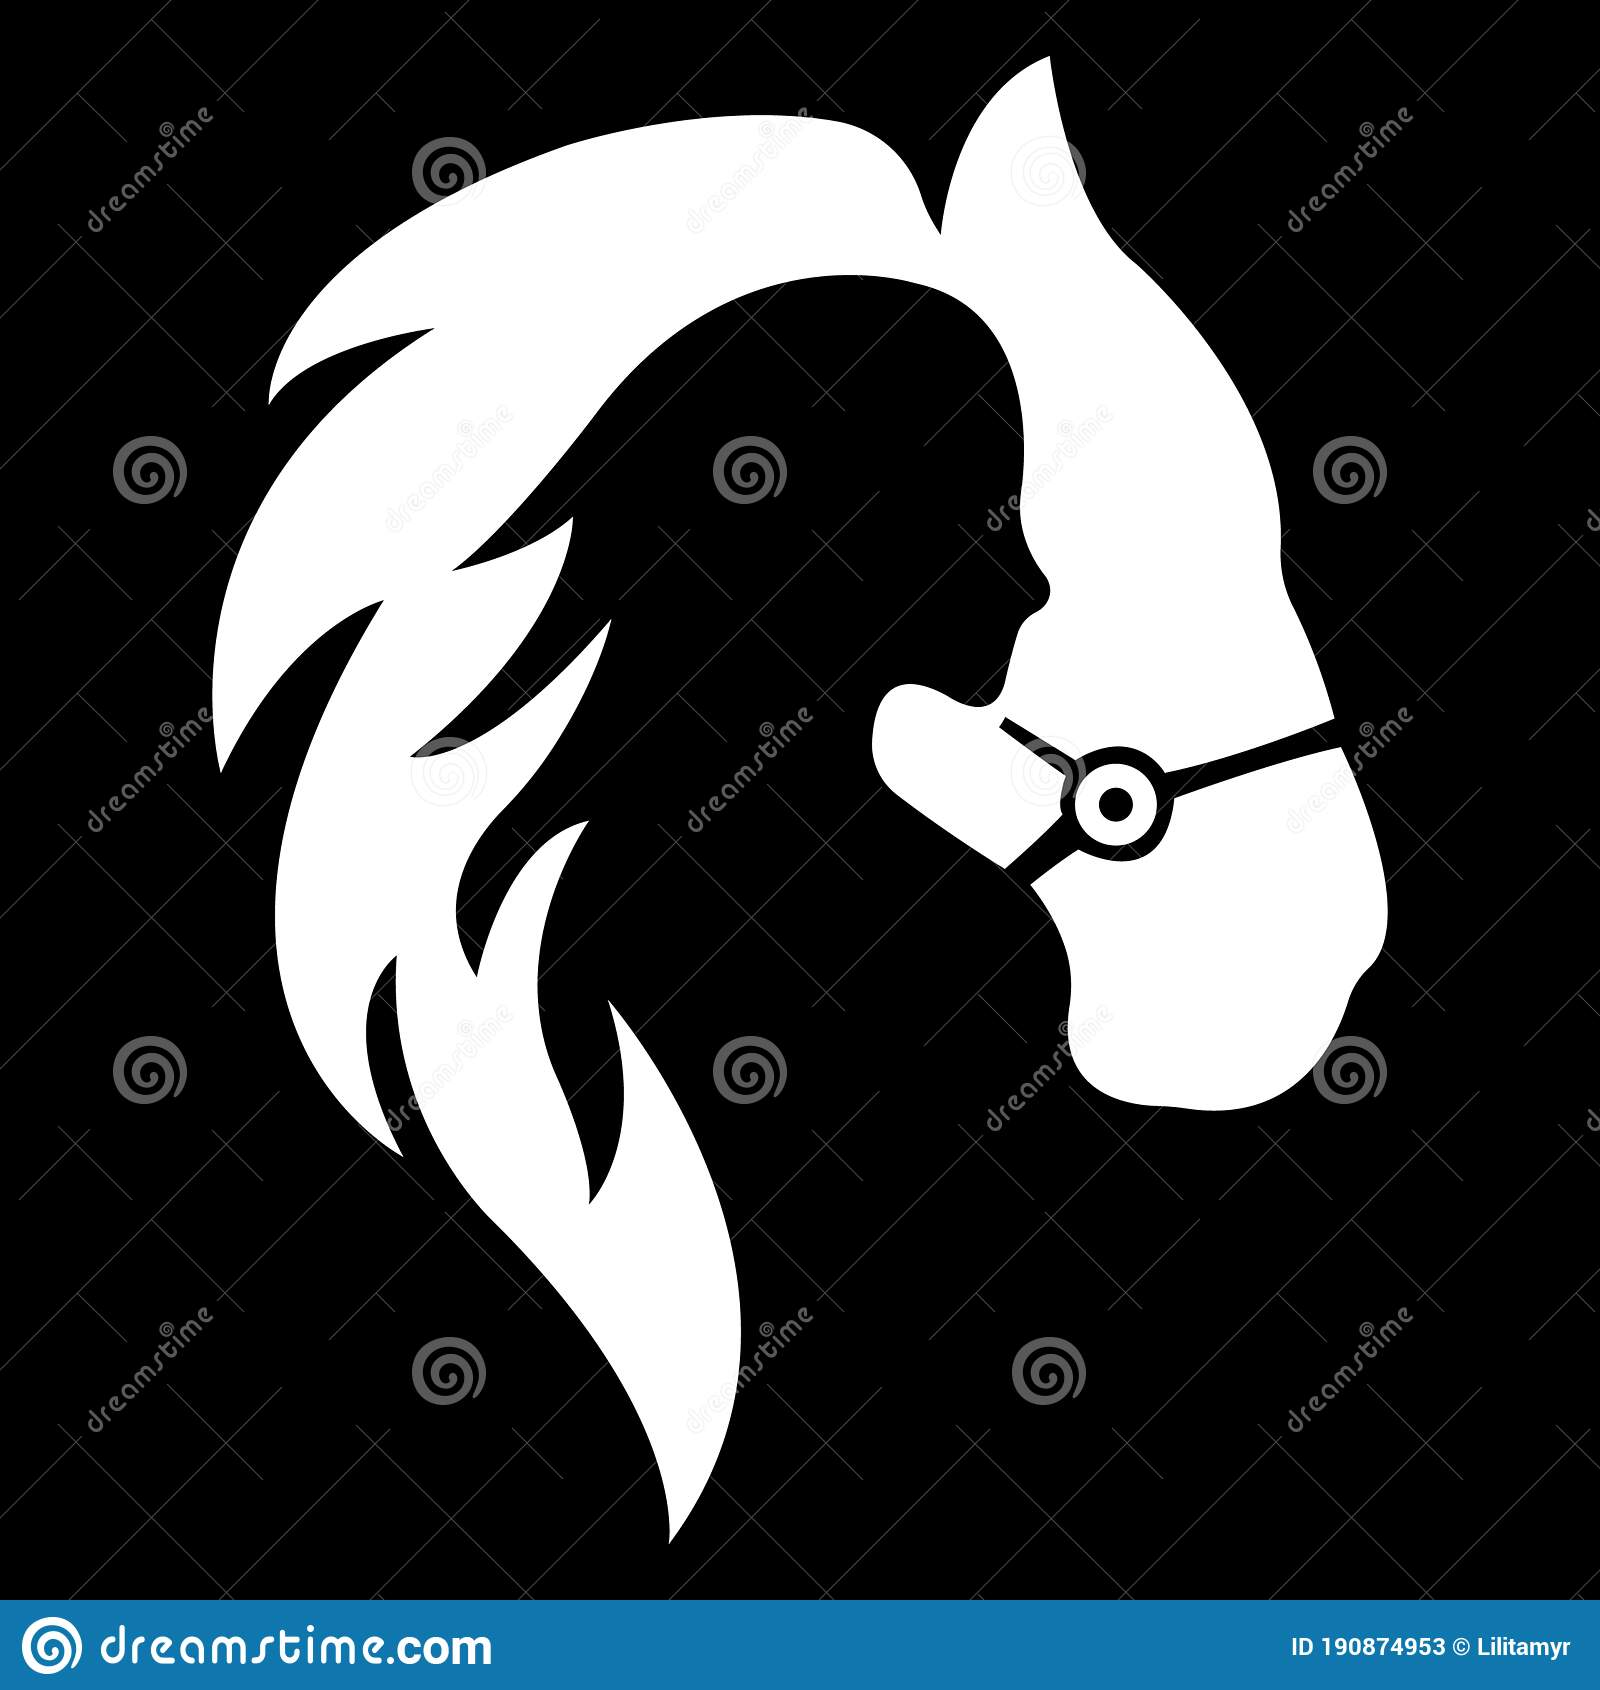 Equestrian Logo Stock Illustrations 7 790 Equestrian Logo Stock Illustrations Vectors Clipart Dreamstime